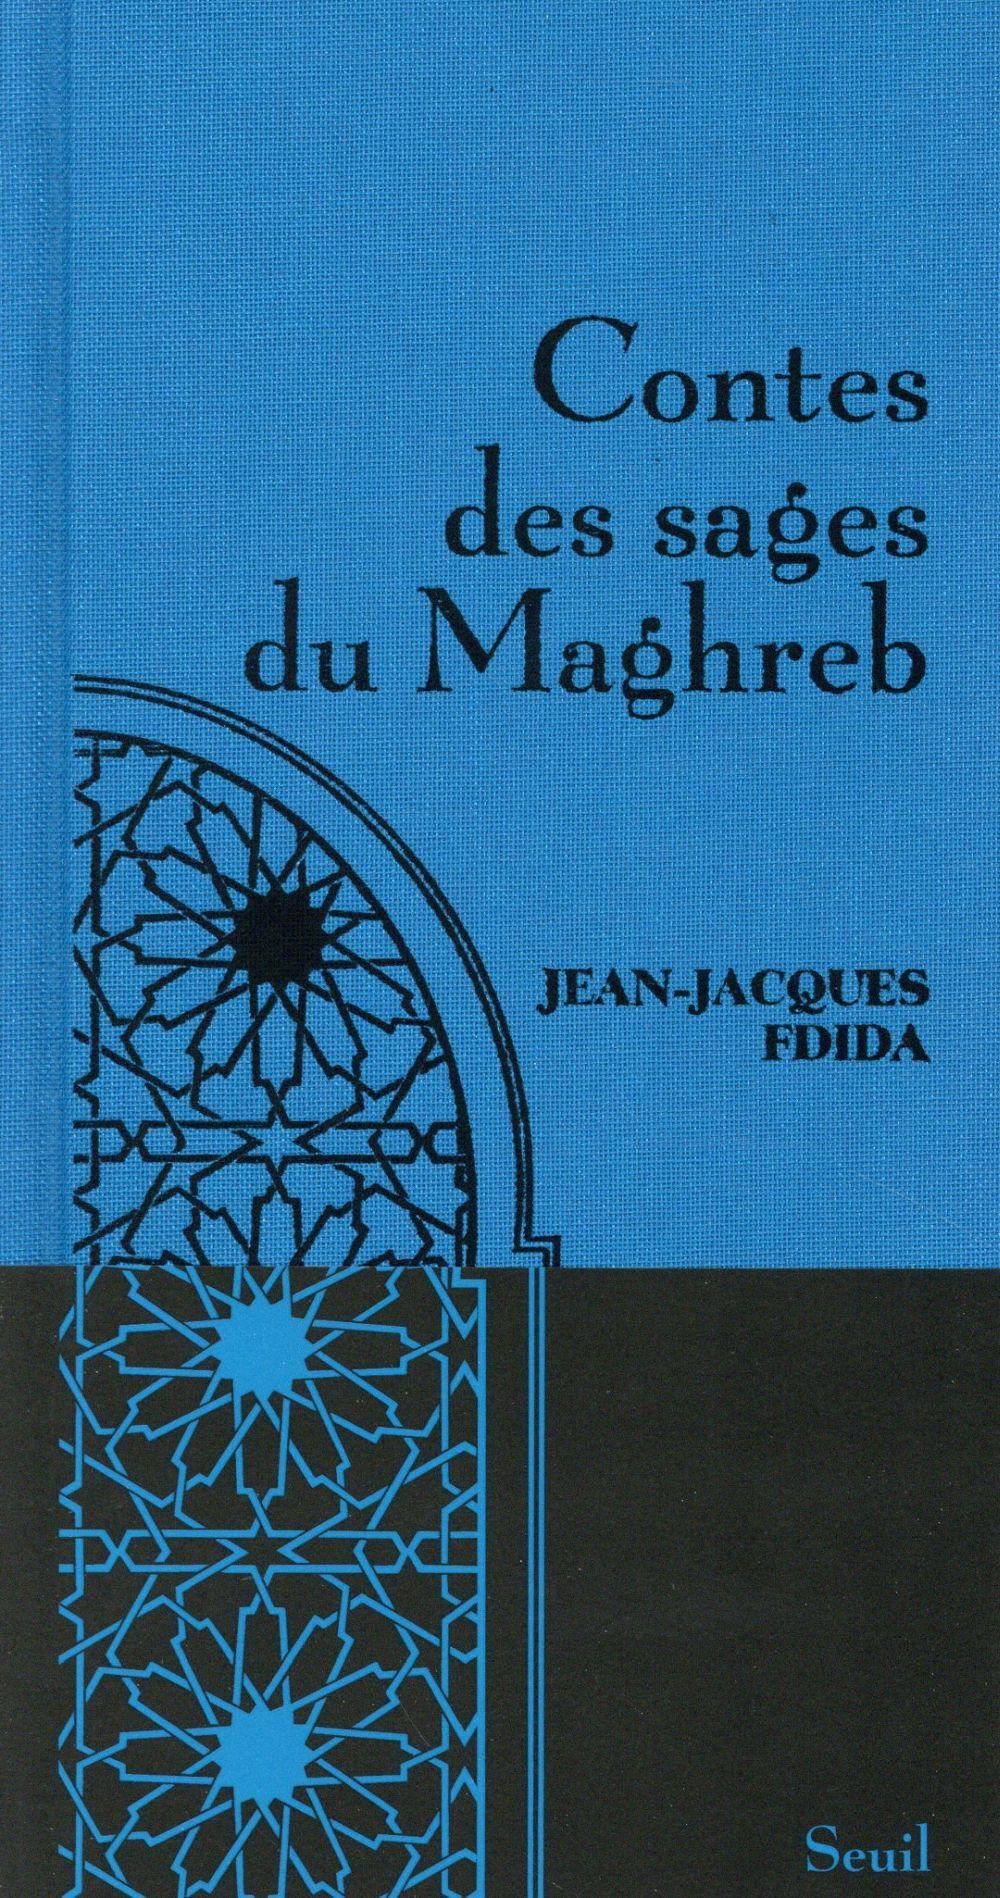 CONTES DES SAGES DU MAGHREB FDIDA JEAN-JACQUES SEUIL